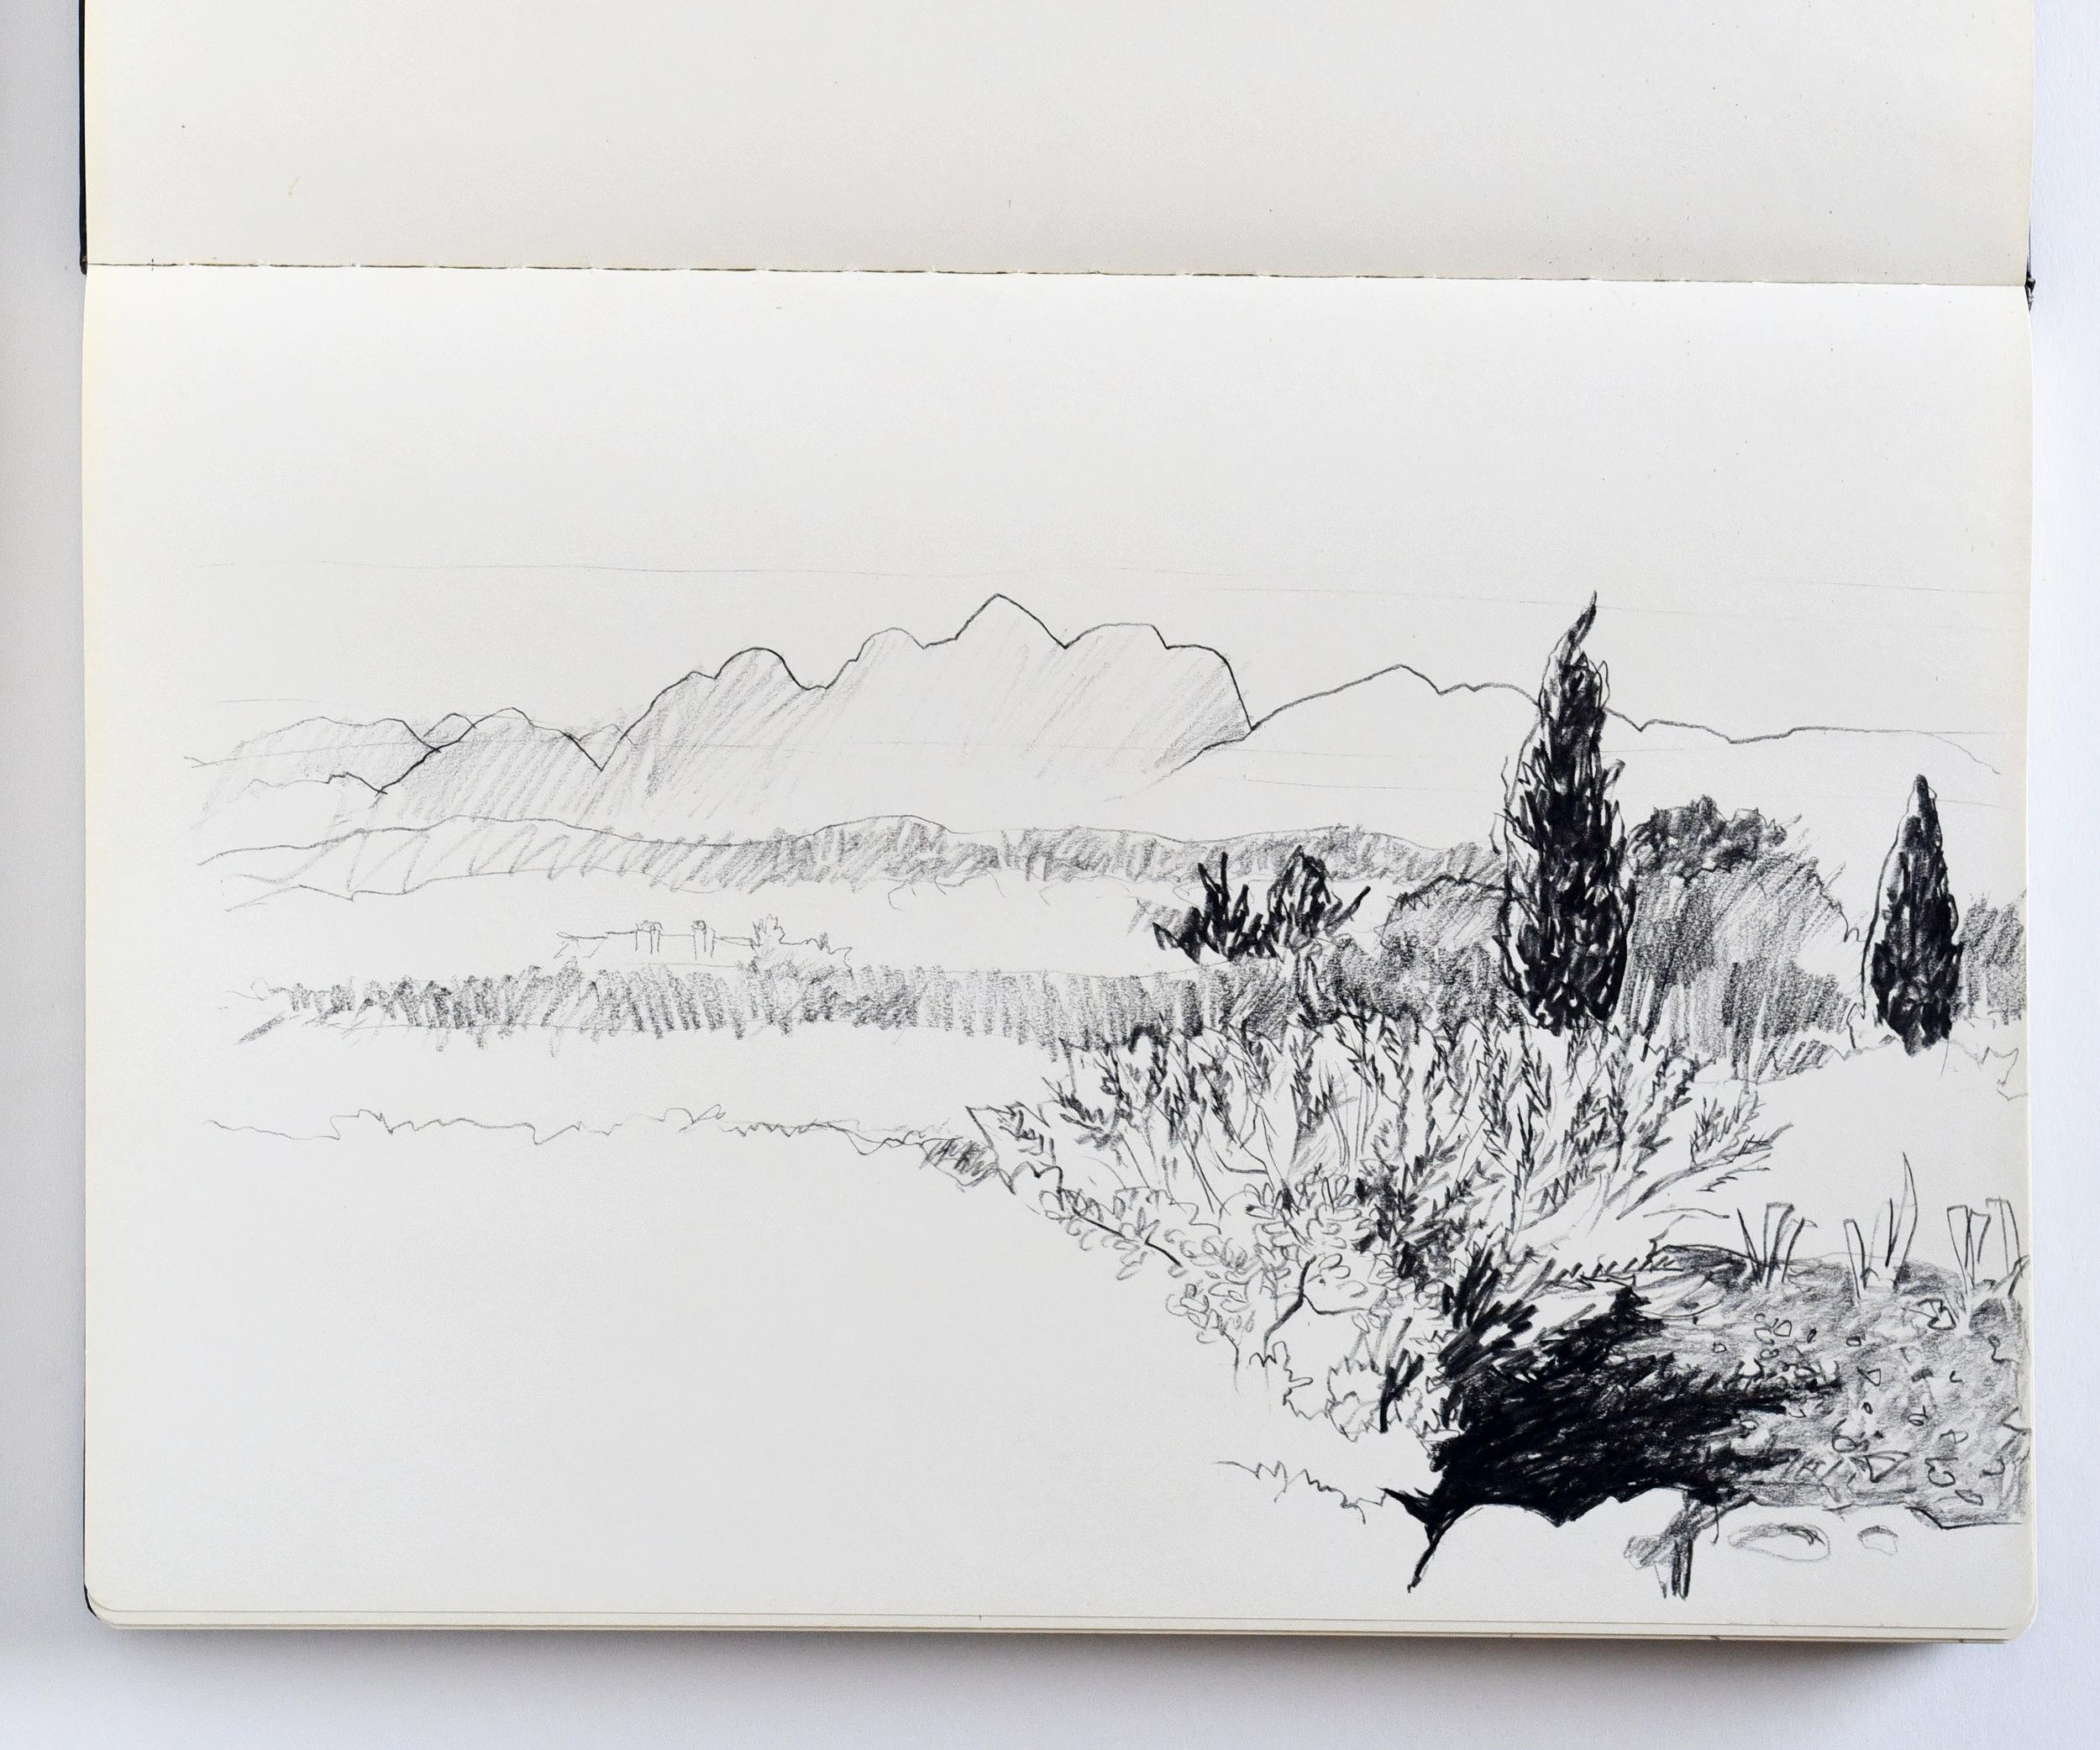 Drawing of view of Alpilles in Saint-Rémy-de-Provence